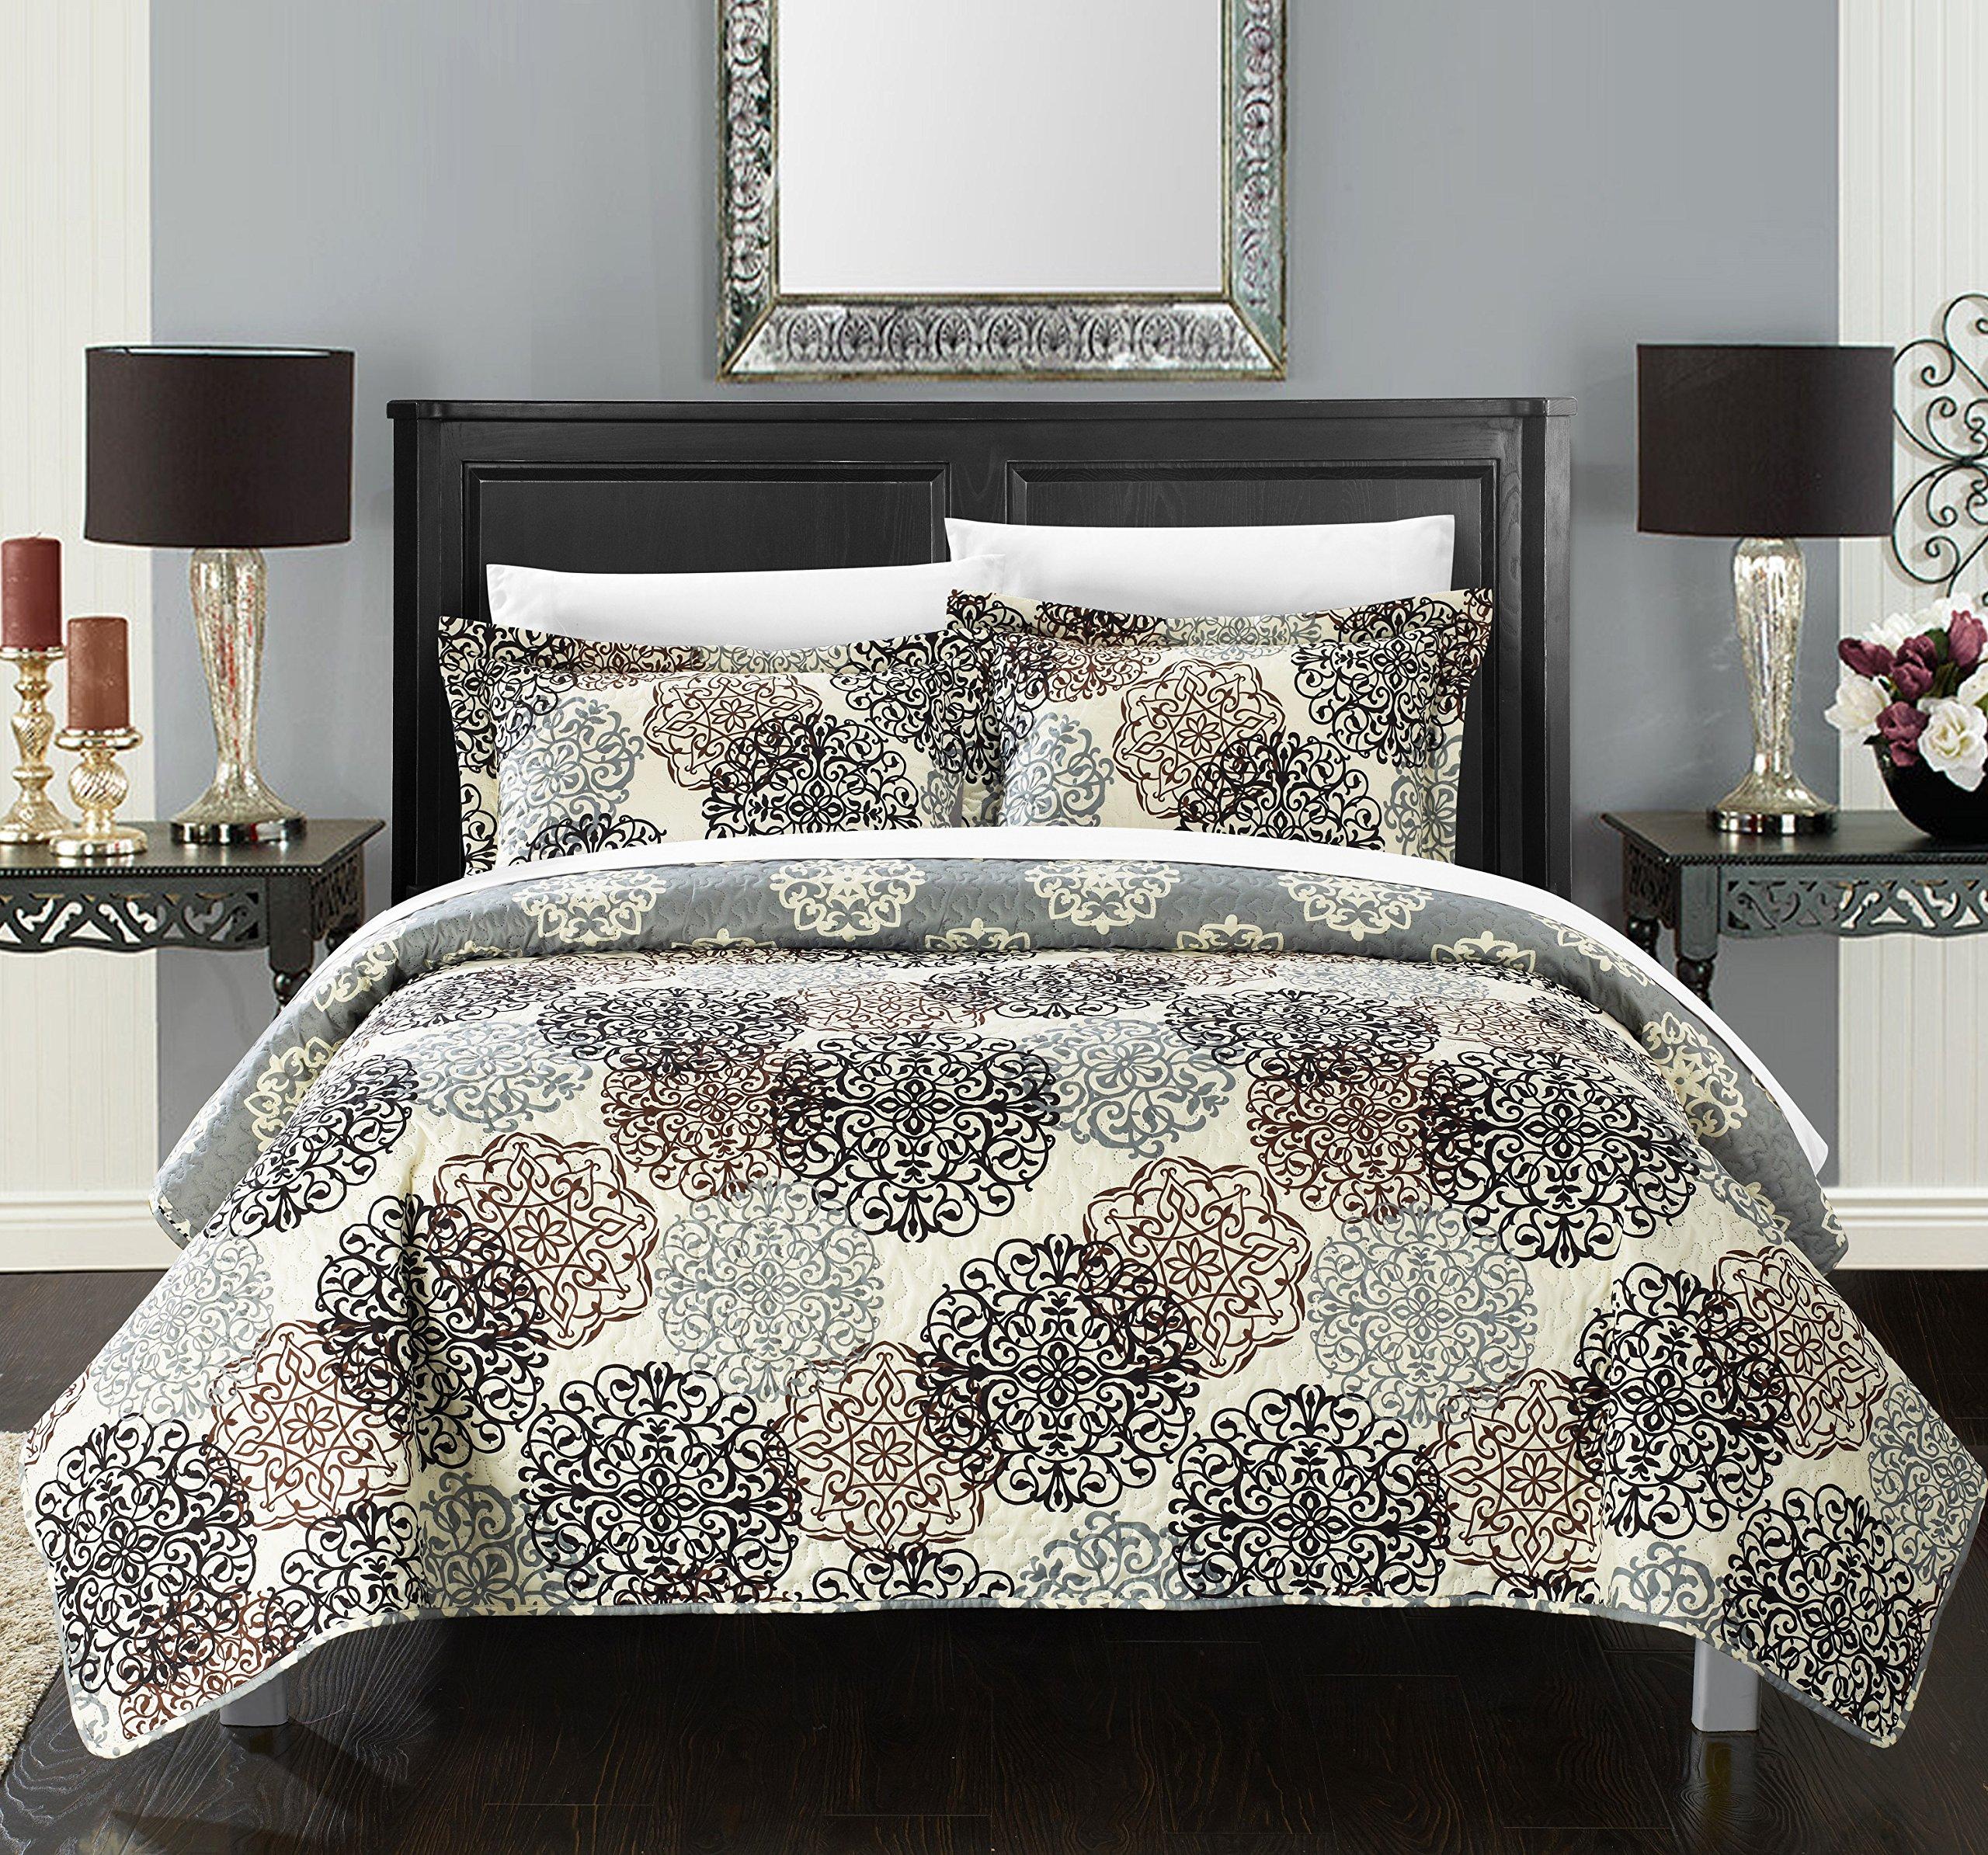 Chic Home 3 Piece Kelsie Boho Inspired Reversible Print Quilt Set, Queen, Beige